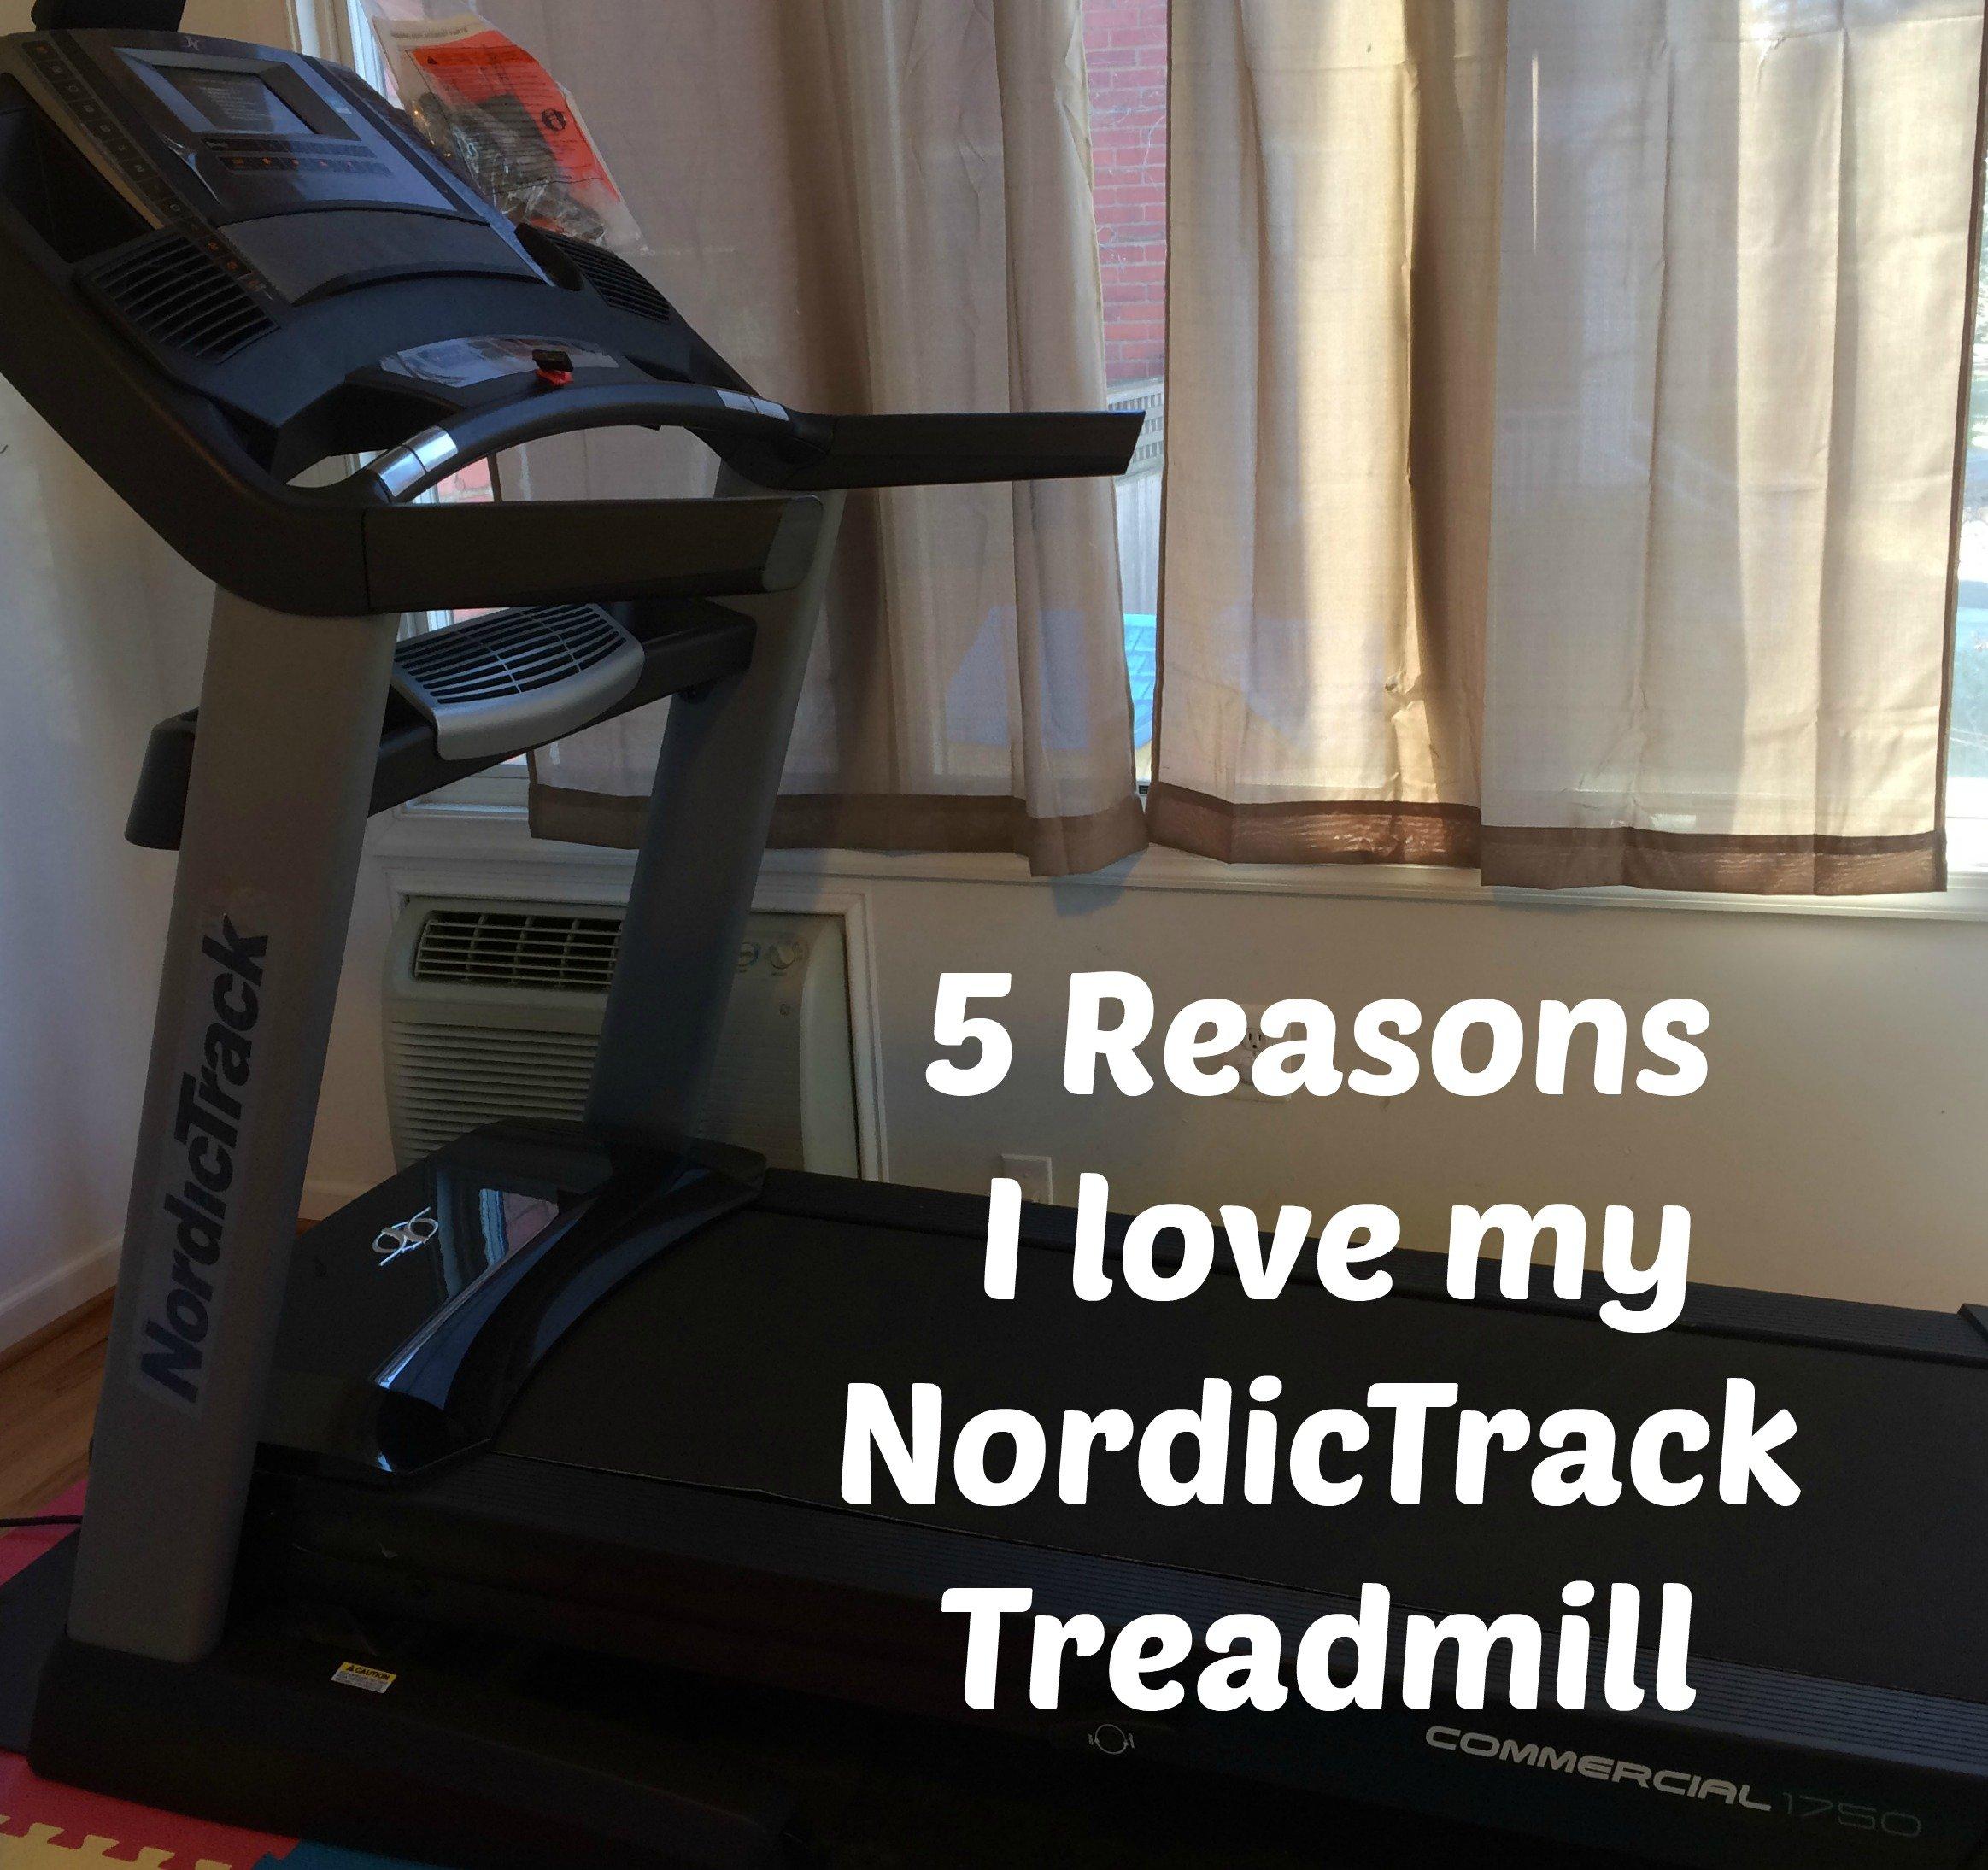 nordictrack-treadmill